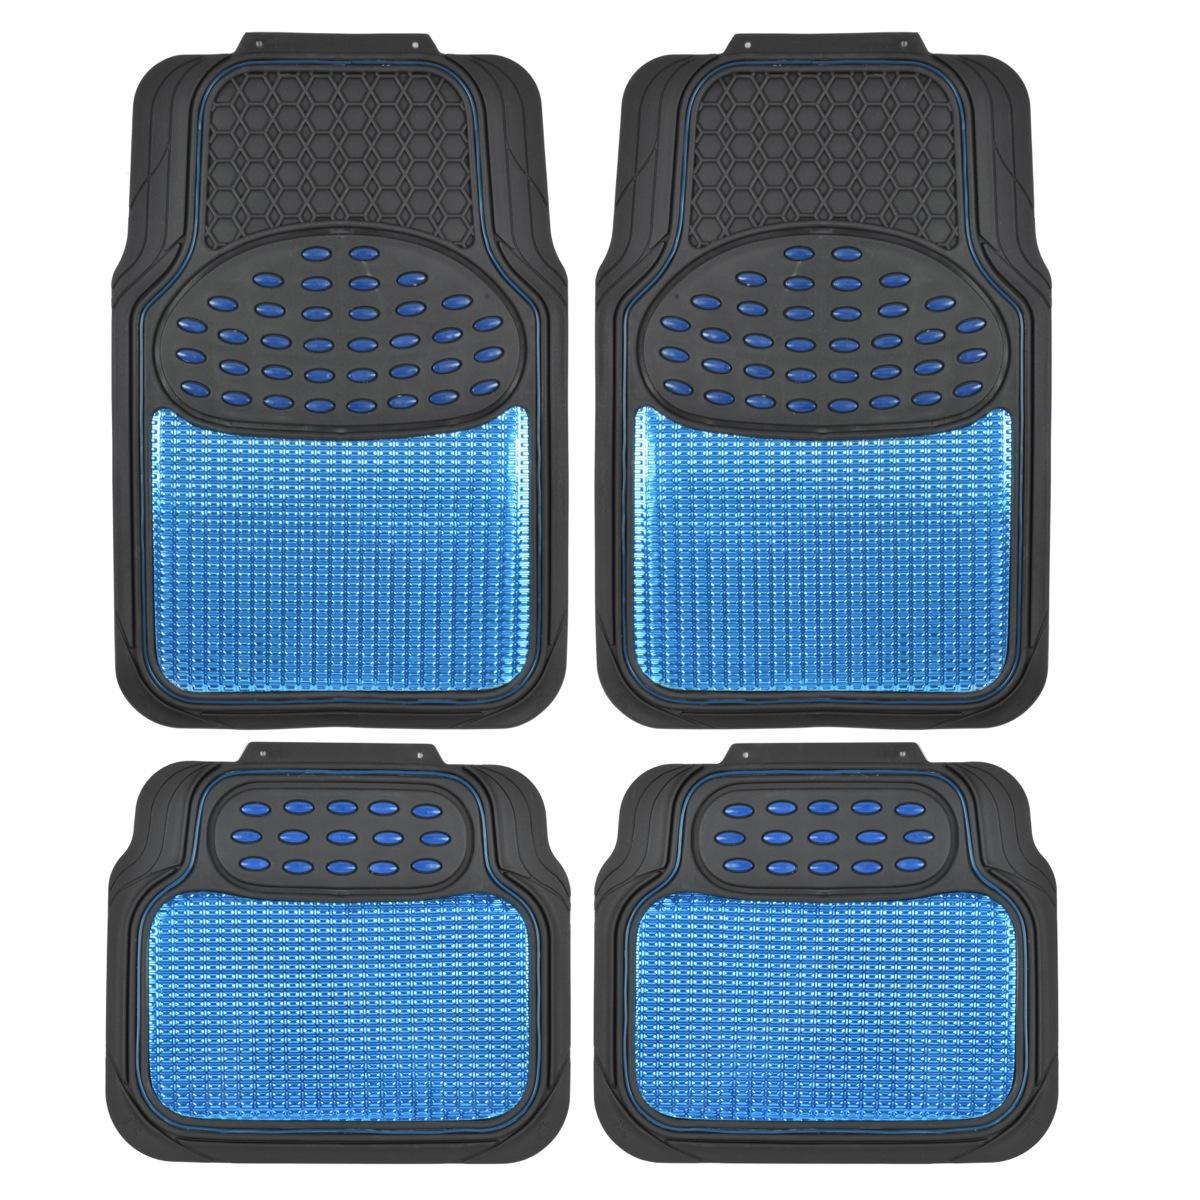 Car Rubber Floor Mats Blue Metallic Design On Black Heavy